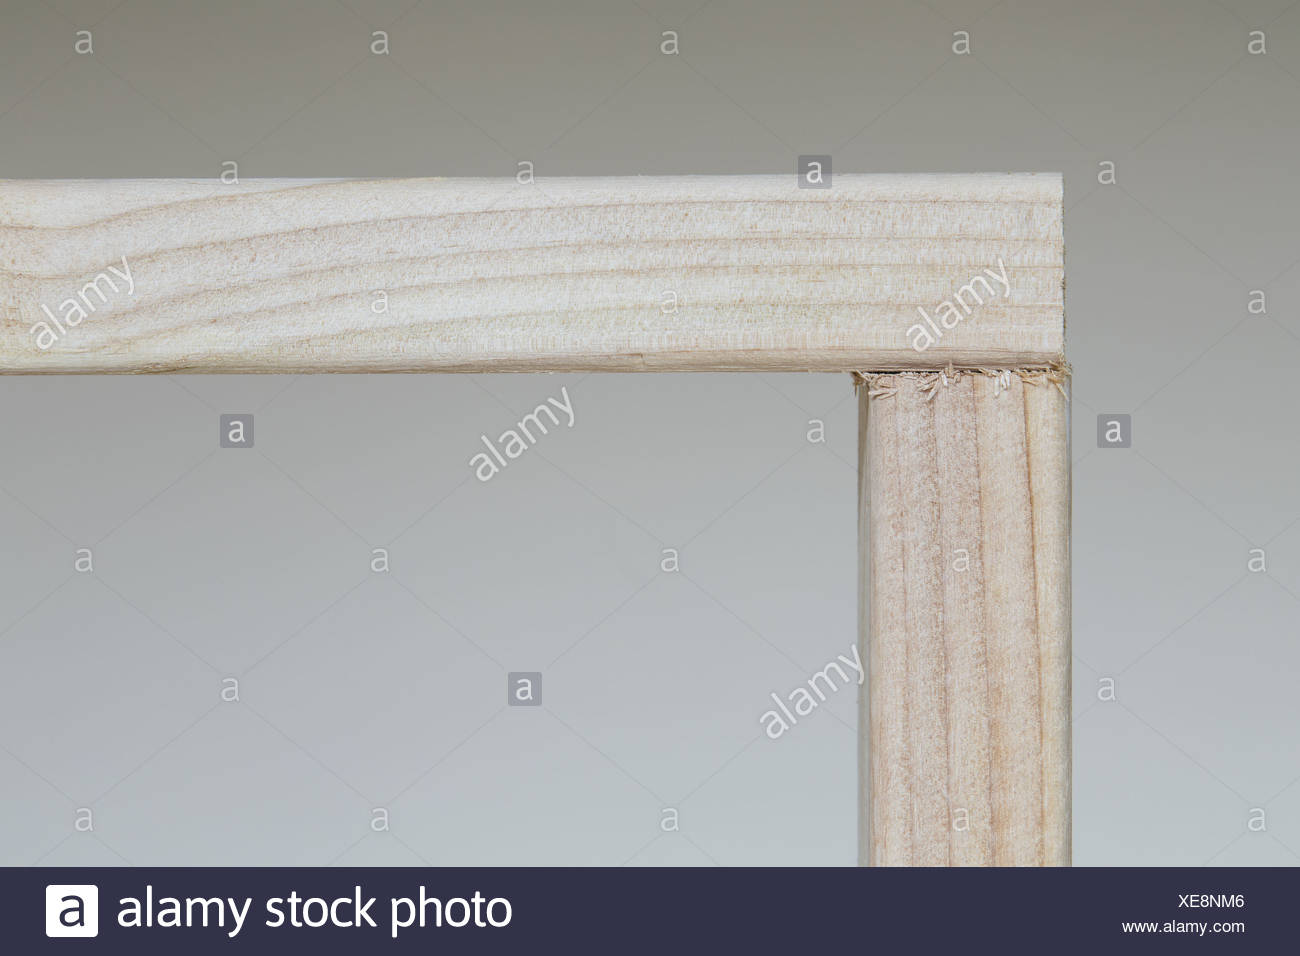 Washington State USA Spruce 2x4 wood studs at right angle - Stock Image